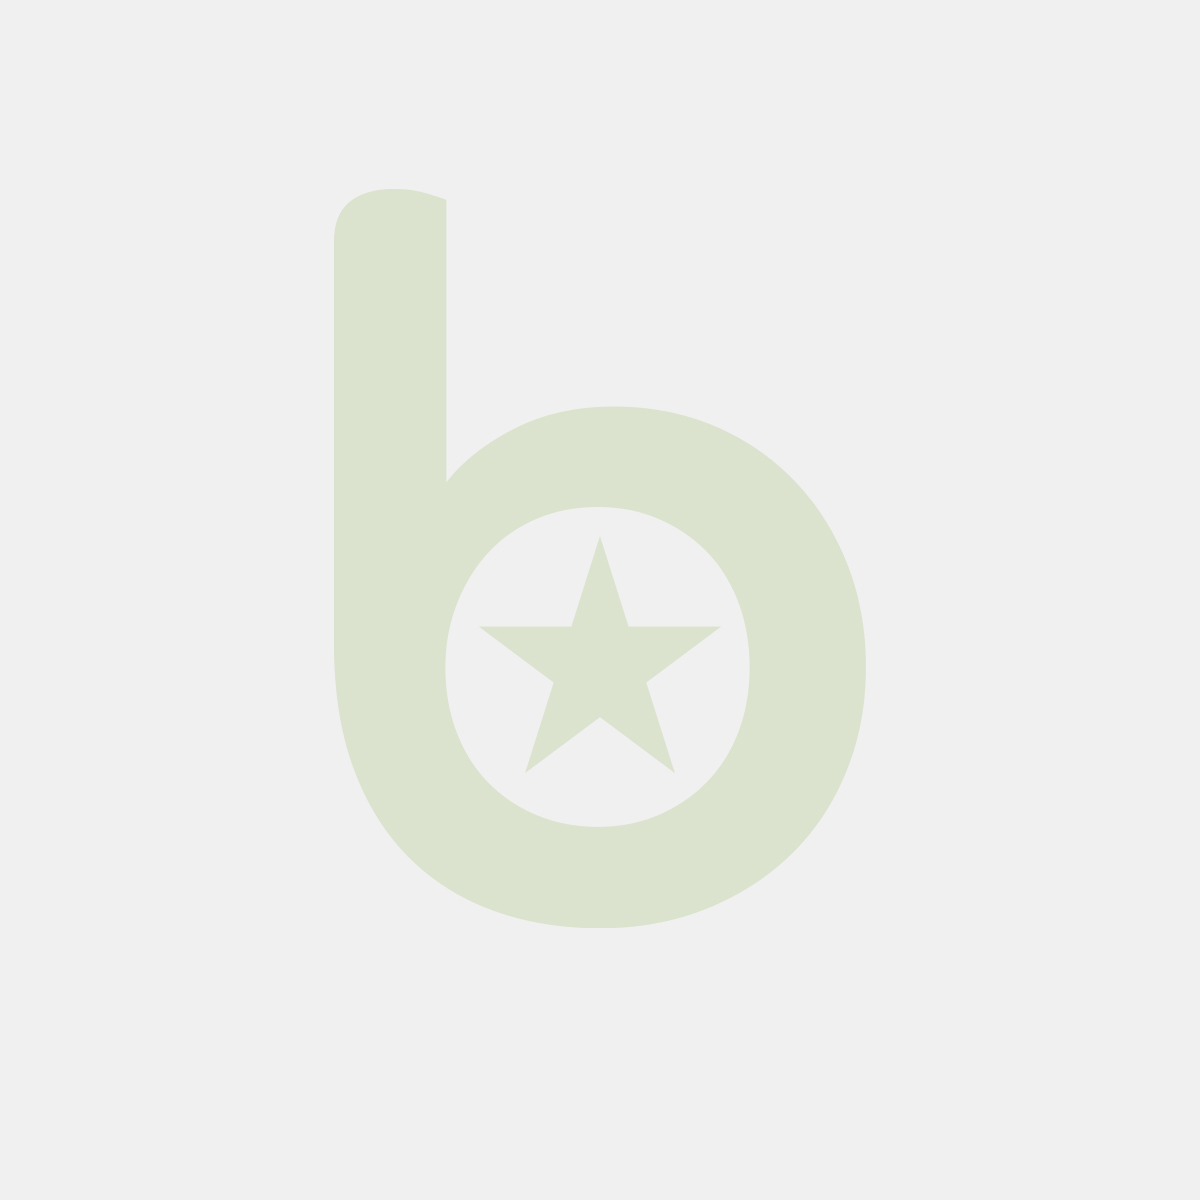 Narzuta na stół PAPSTAR Soft Selection 80x80 c. zieleń, włóknina